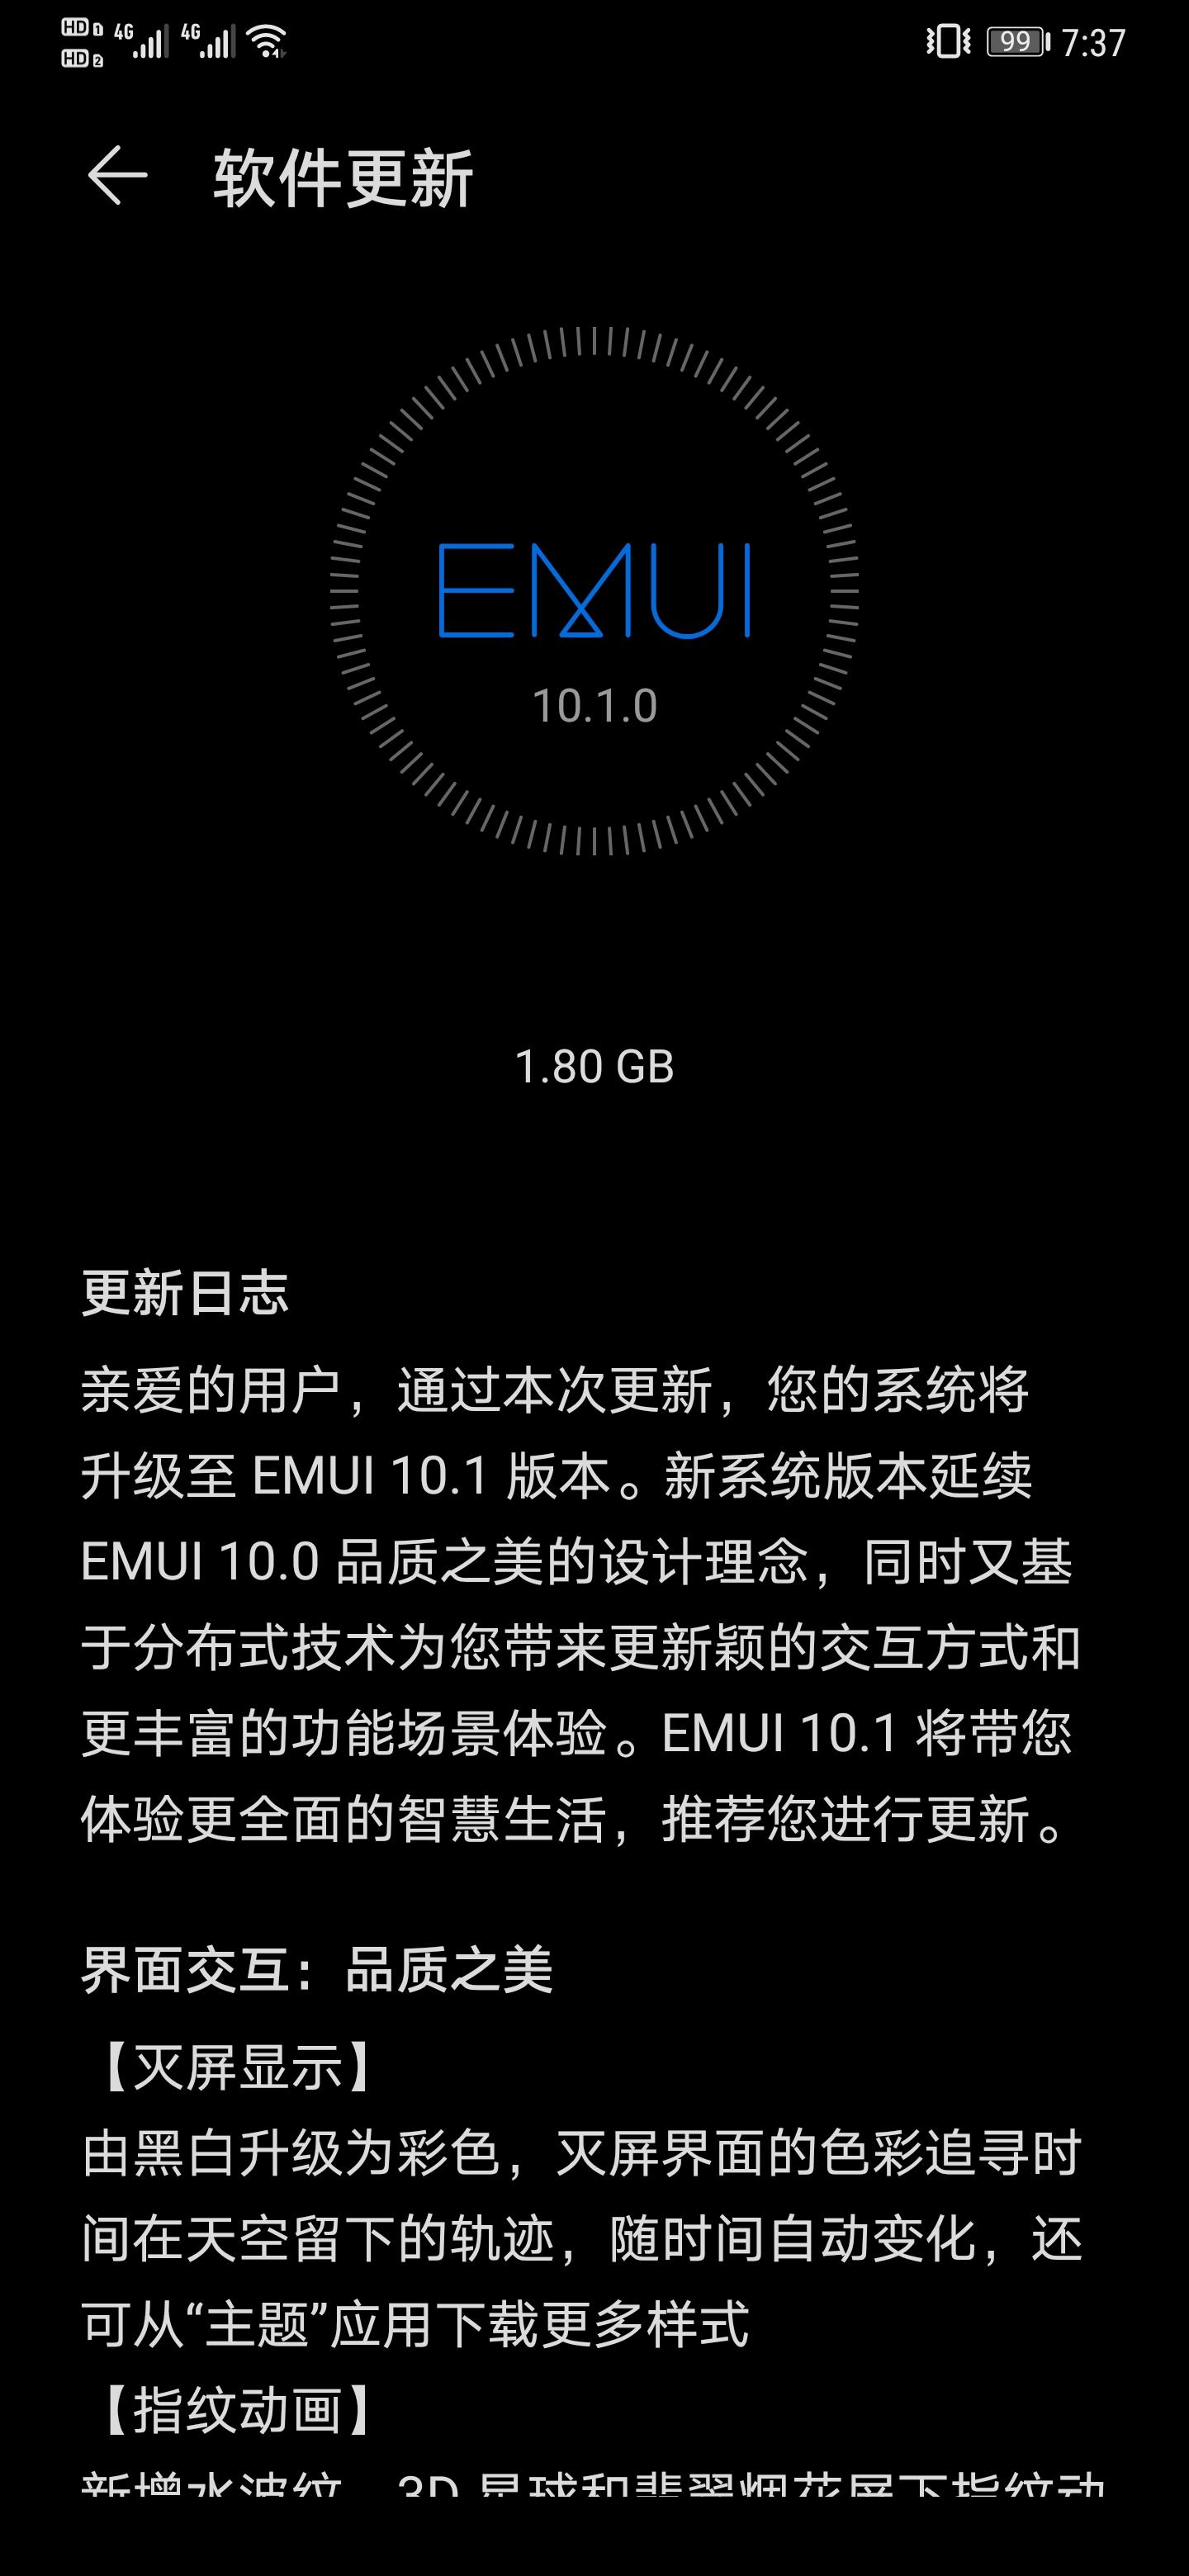 Screenshot_20200510_073702_com.huawei.android.hwouc.jpg